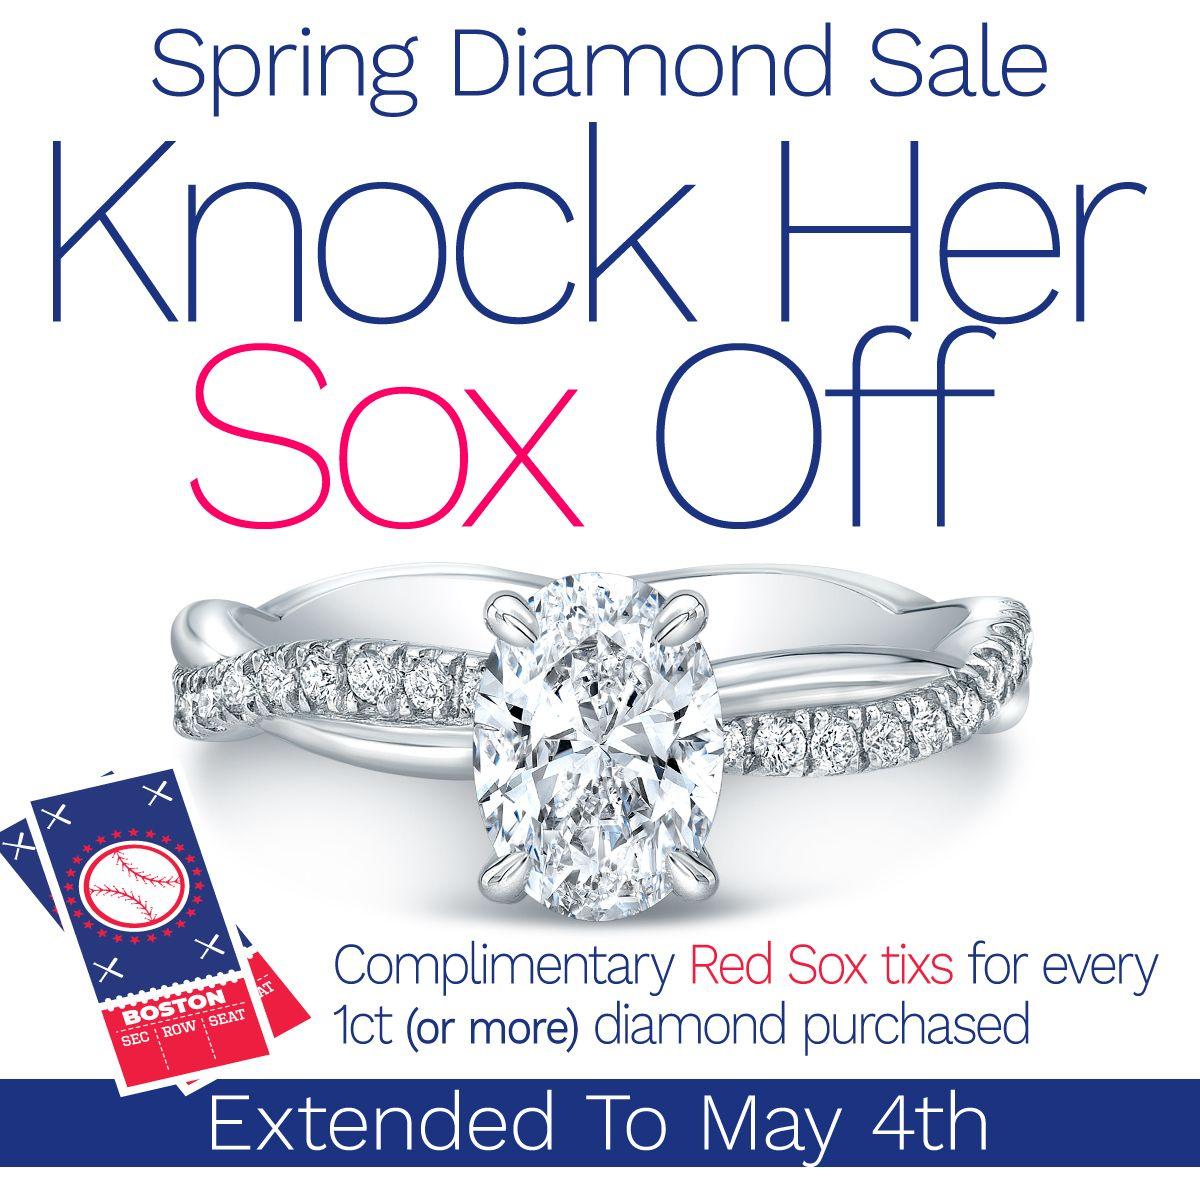 Deprisco Diamond Jewelers Spring Diamond Sale Extended To Sat May 4th Diamond Sale Engagement Rings Sale Engagement Rings